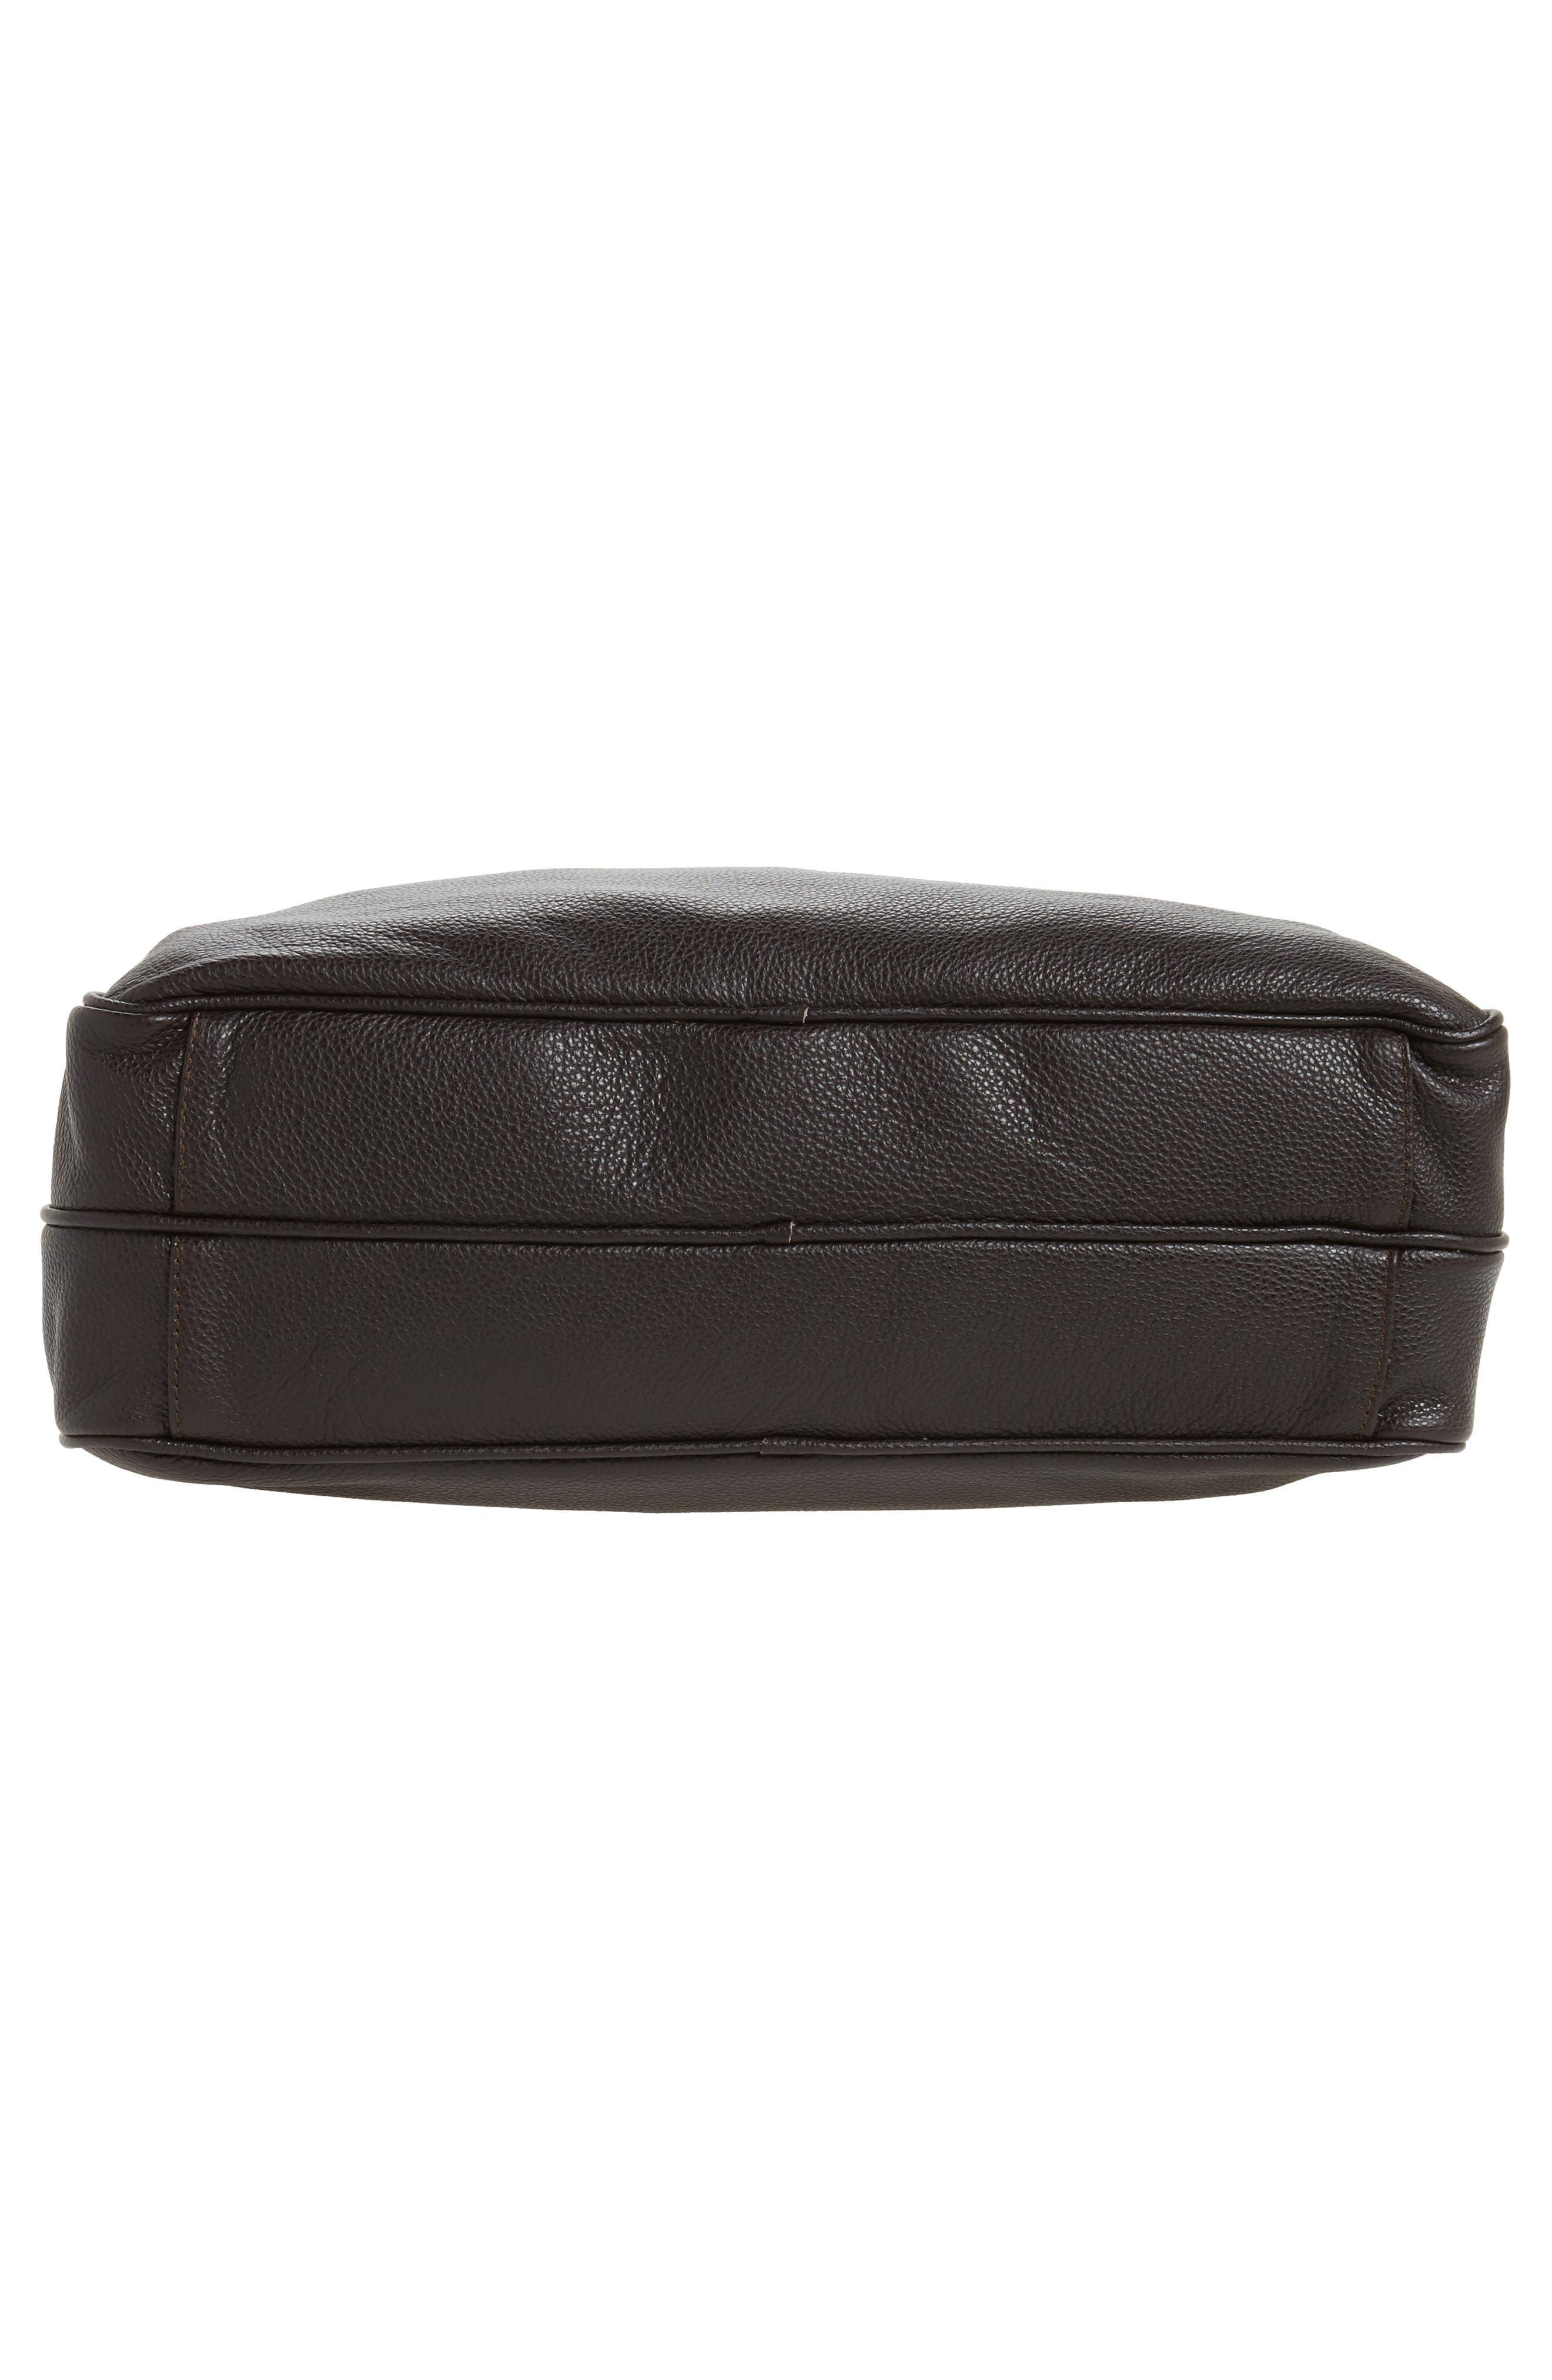 Leather Laptop Bag,                             Alternate thumbnail 12, color,